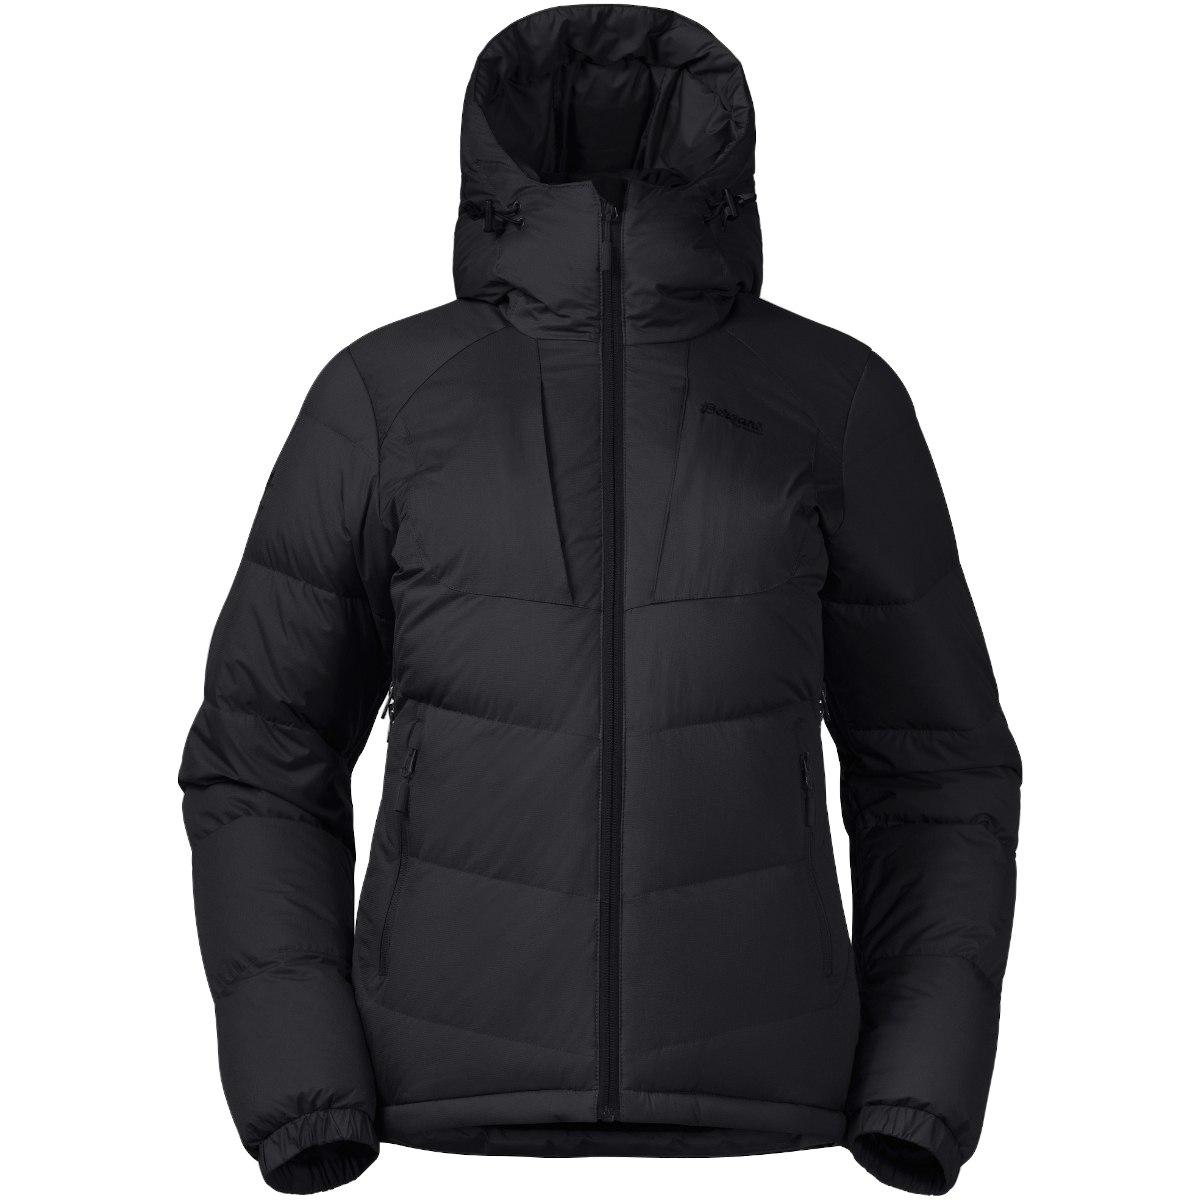 Image of Bergans Sauda Down Women's Jacket - solid charcoal/black